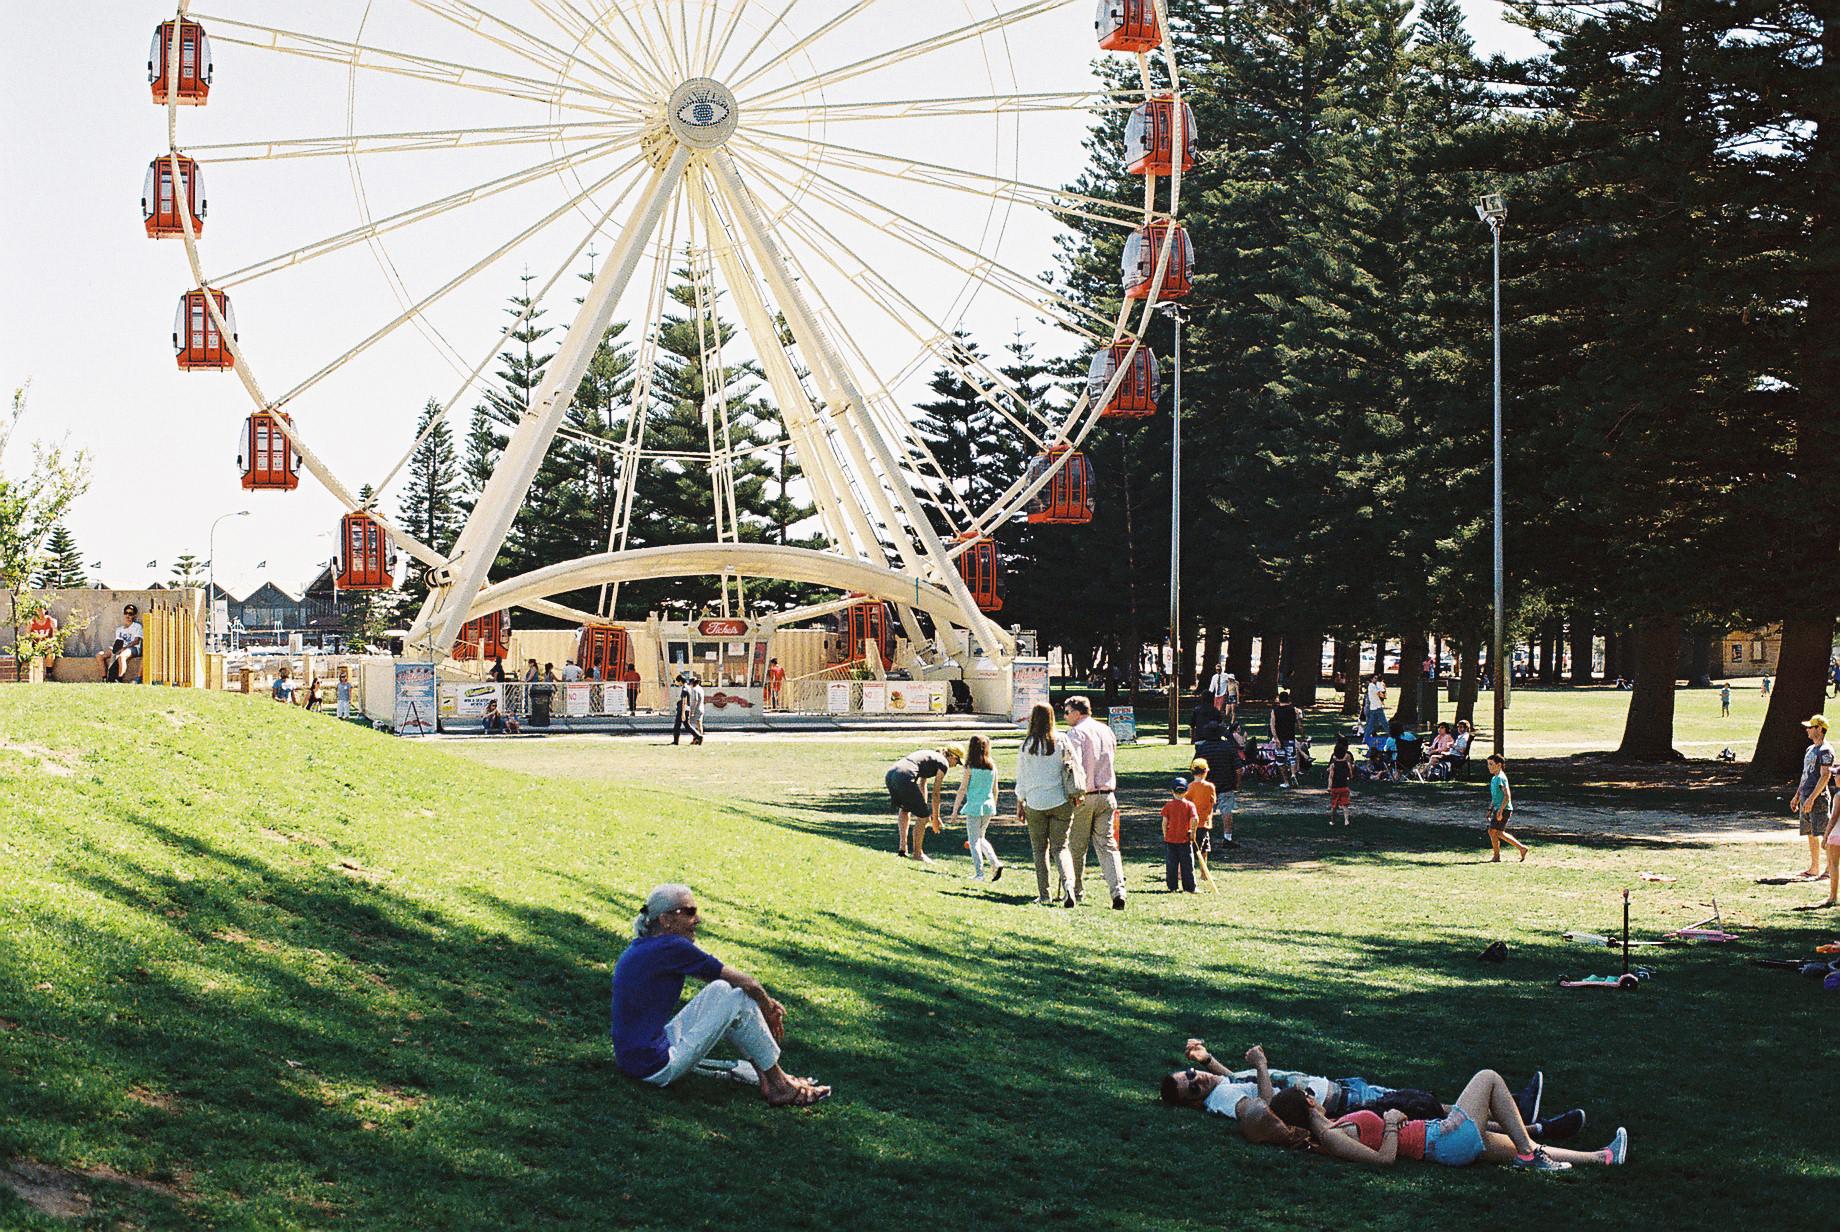 esplanade_park_fremantle_eyp.JPG